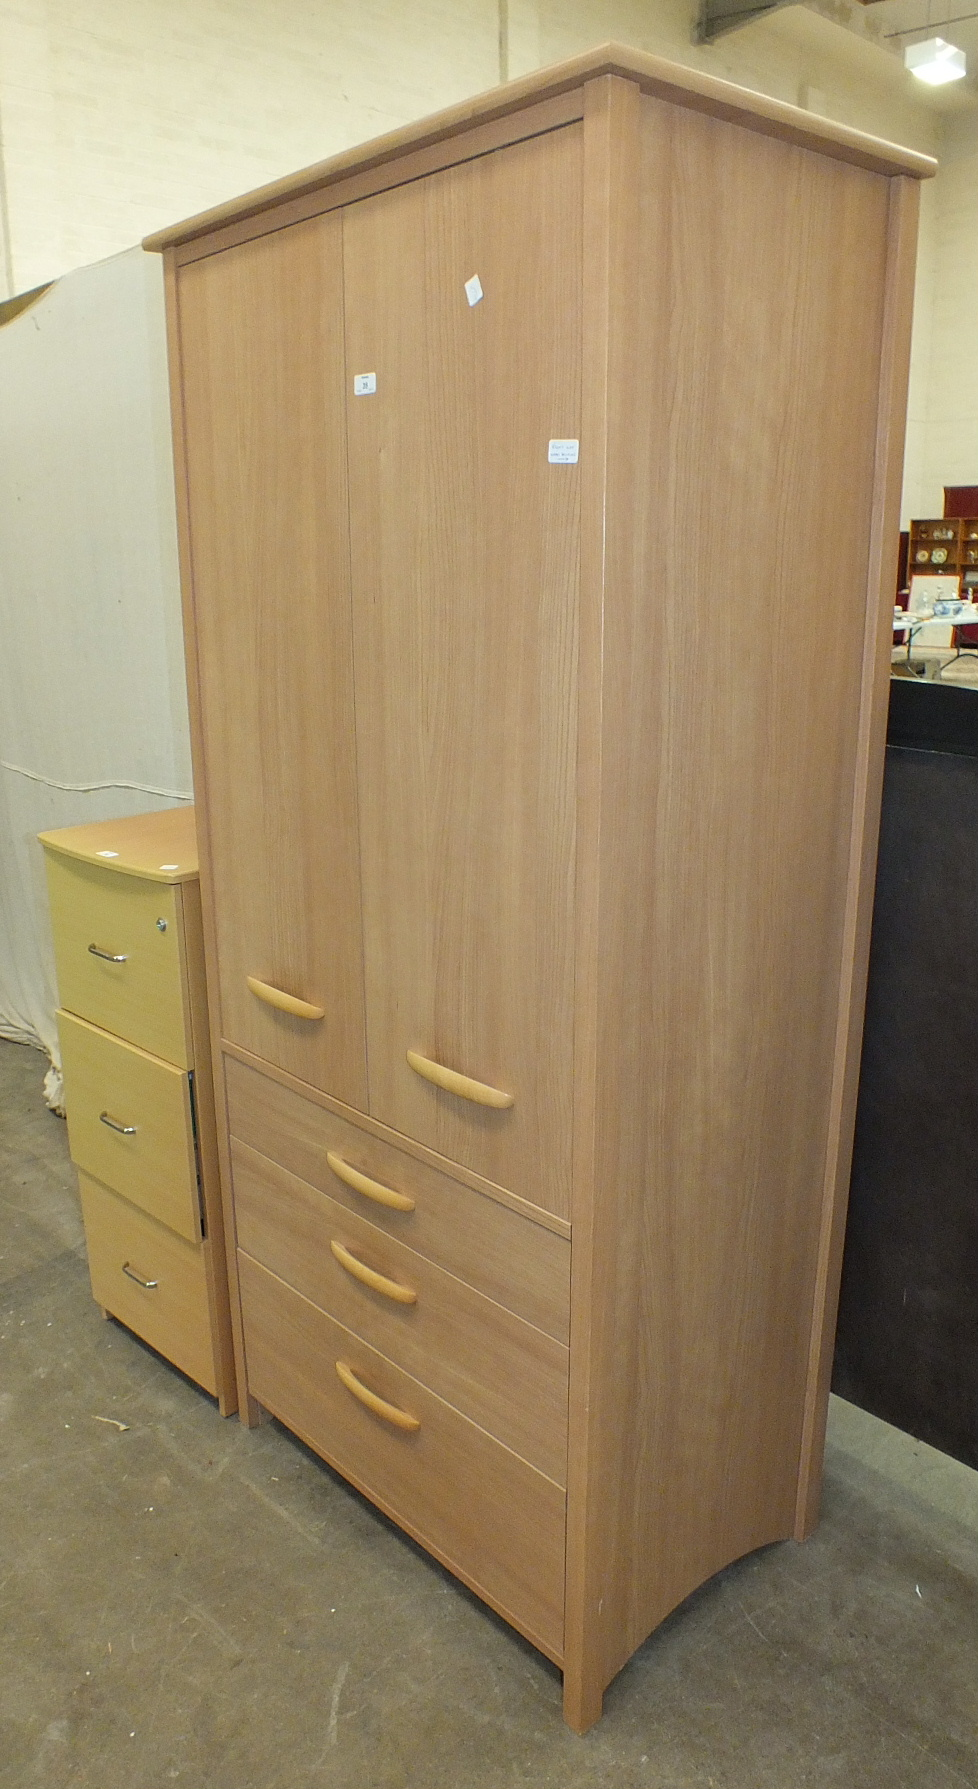 Lot 35 - A modern wood finish three-drawer filing cabinet and a modern teak finish wardrobe, (2).